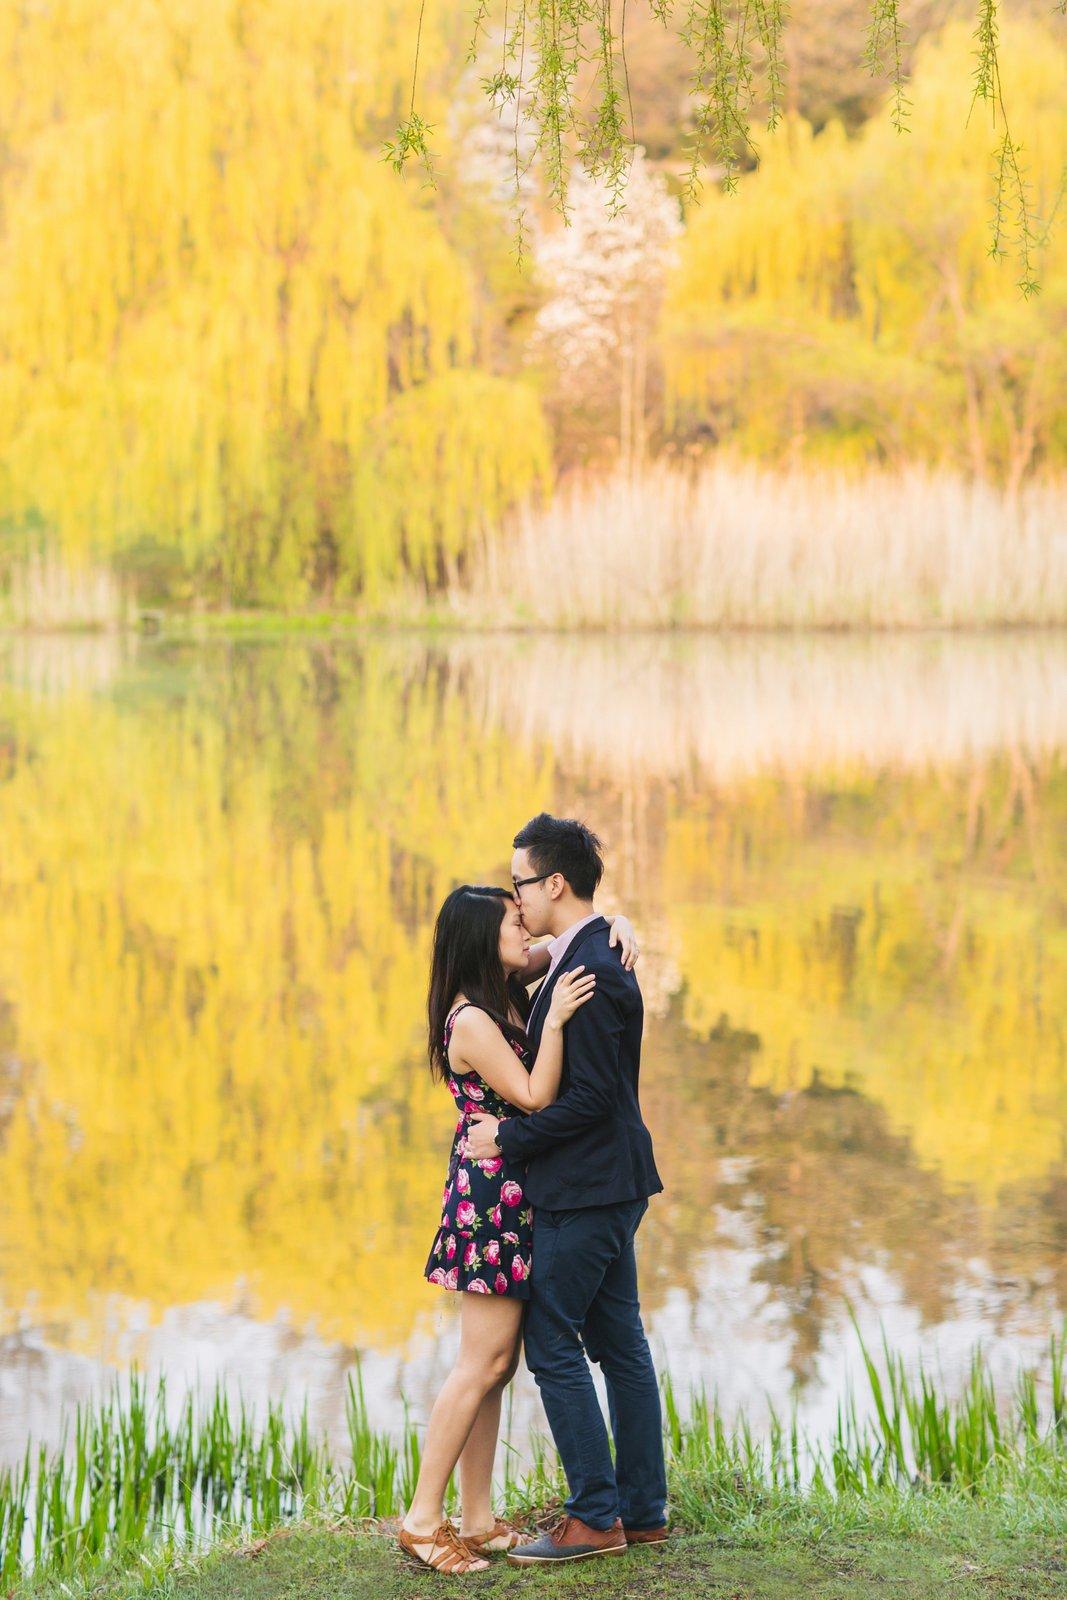 Jessica-Charles-Engagement-High-Park-Cherry-Blossom-005